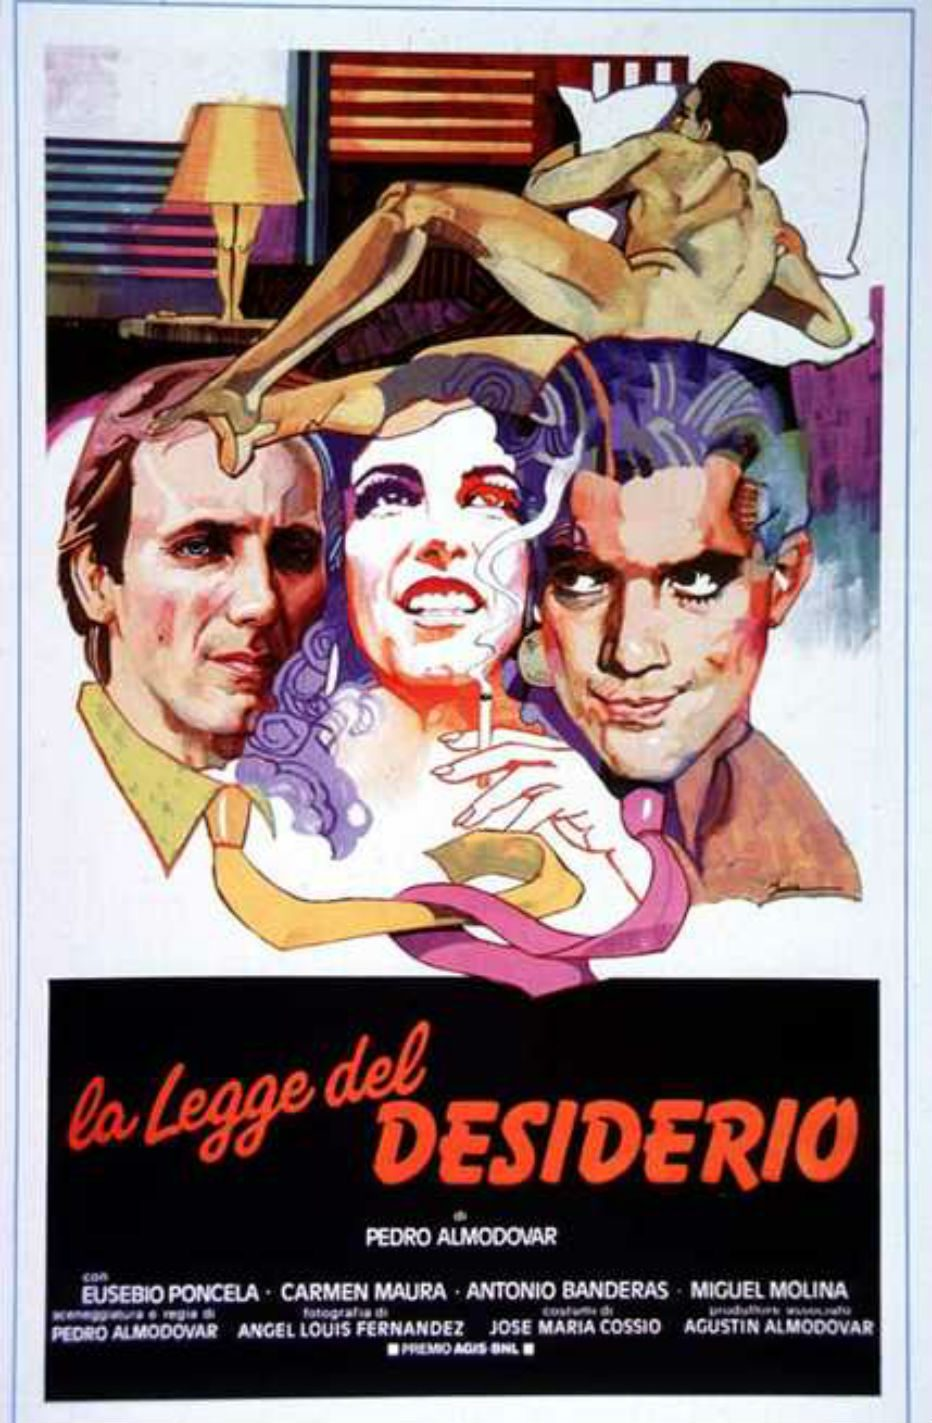 LA LEGGE DEL DESIDERIO – Pedro ALMODOVAR